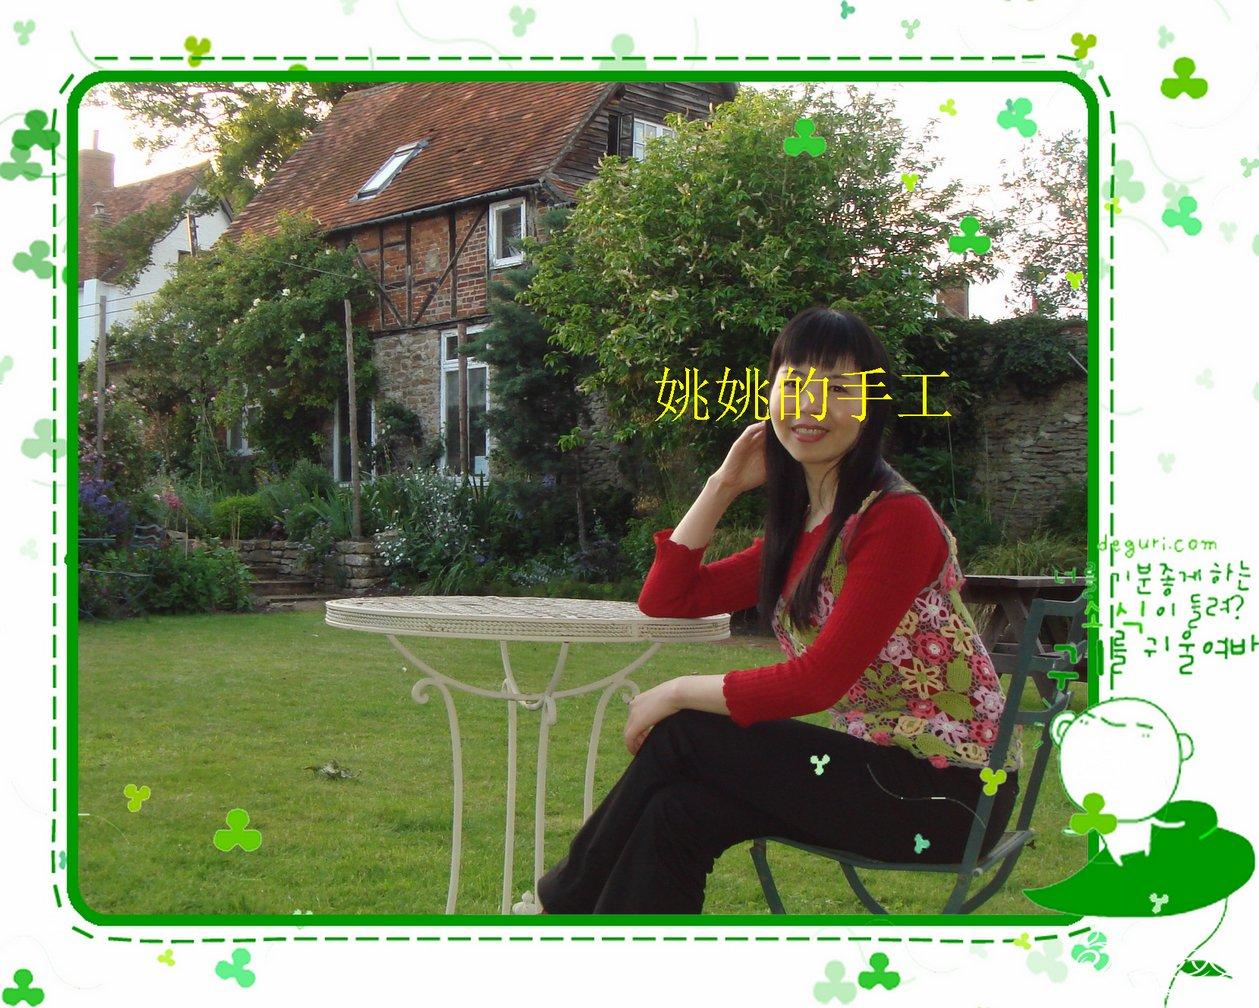 DSC08846-1.jpg